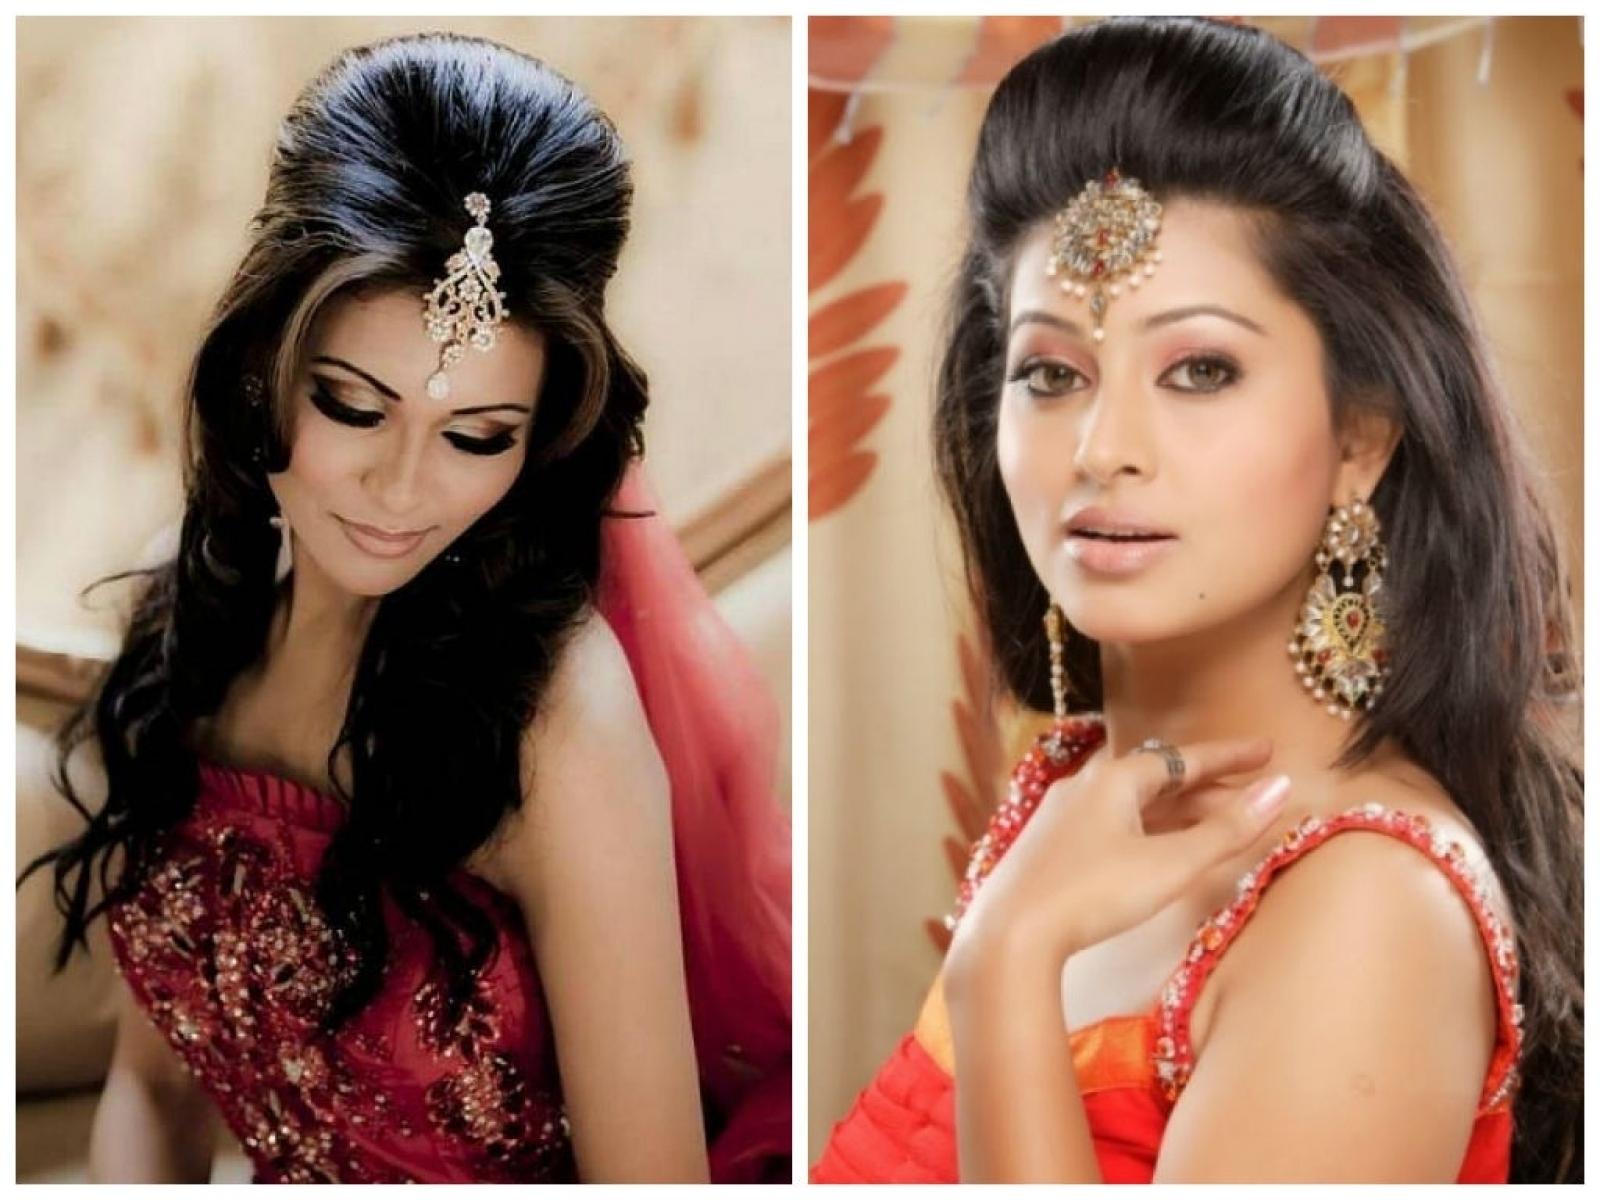 hairstyle for thin hair indian wedding - wavy haircut